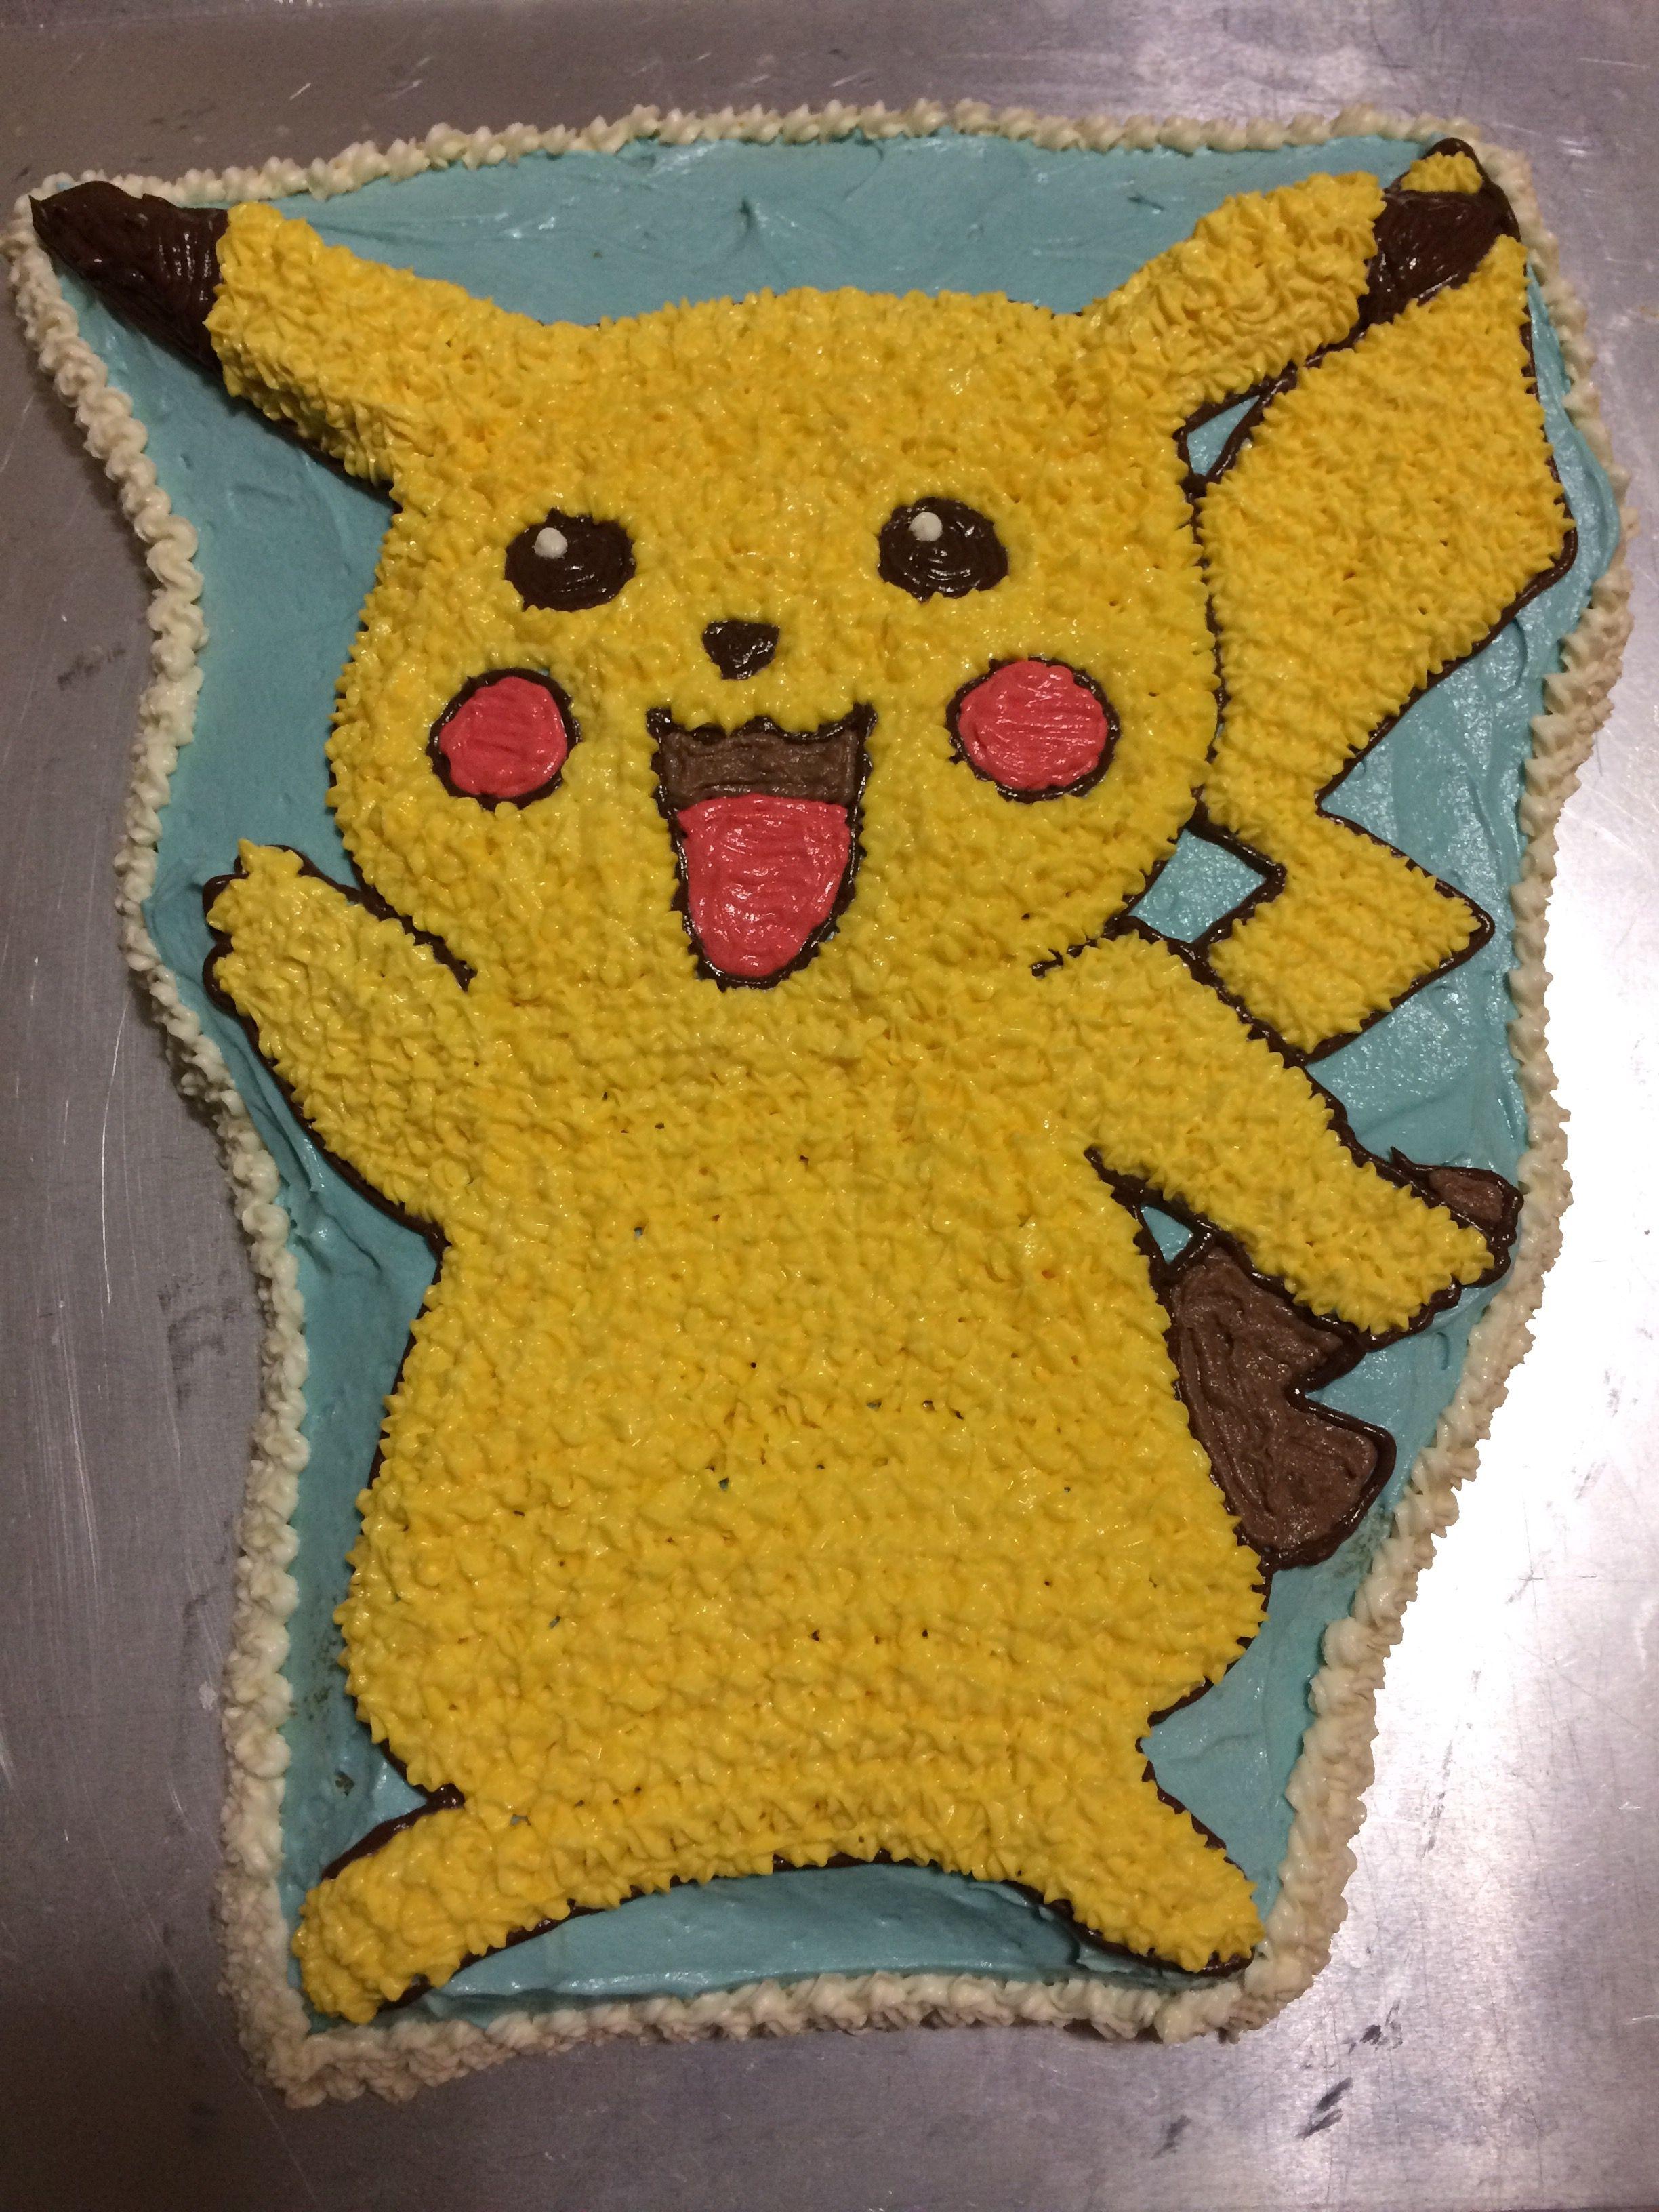 Pikachu Cake Using Wilton Cake Pan And Decorating